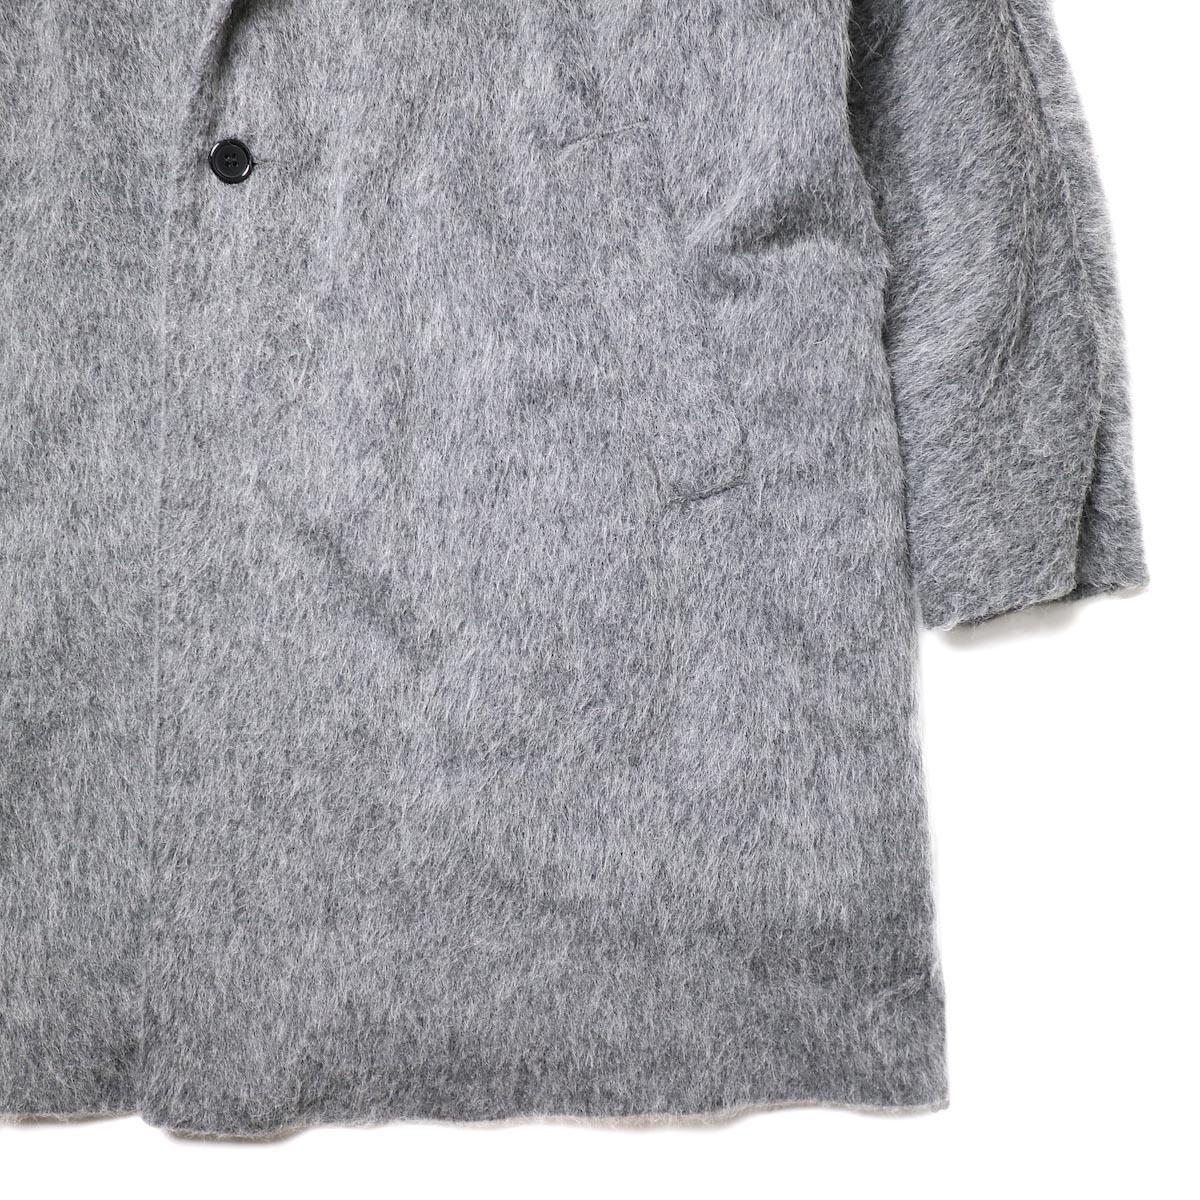 BASISBROEK / RECHT (med grey) 袖・裾